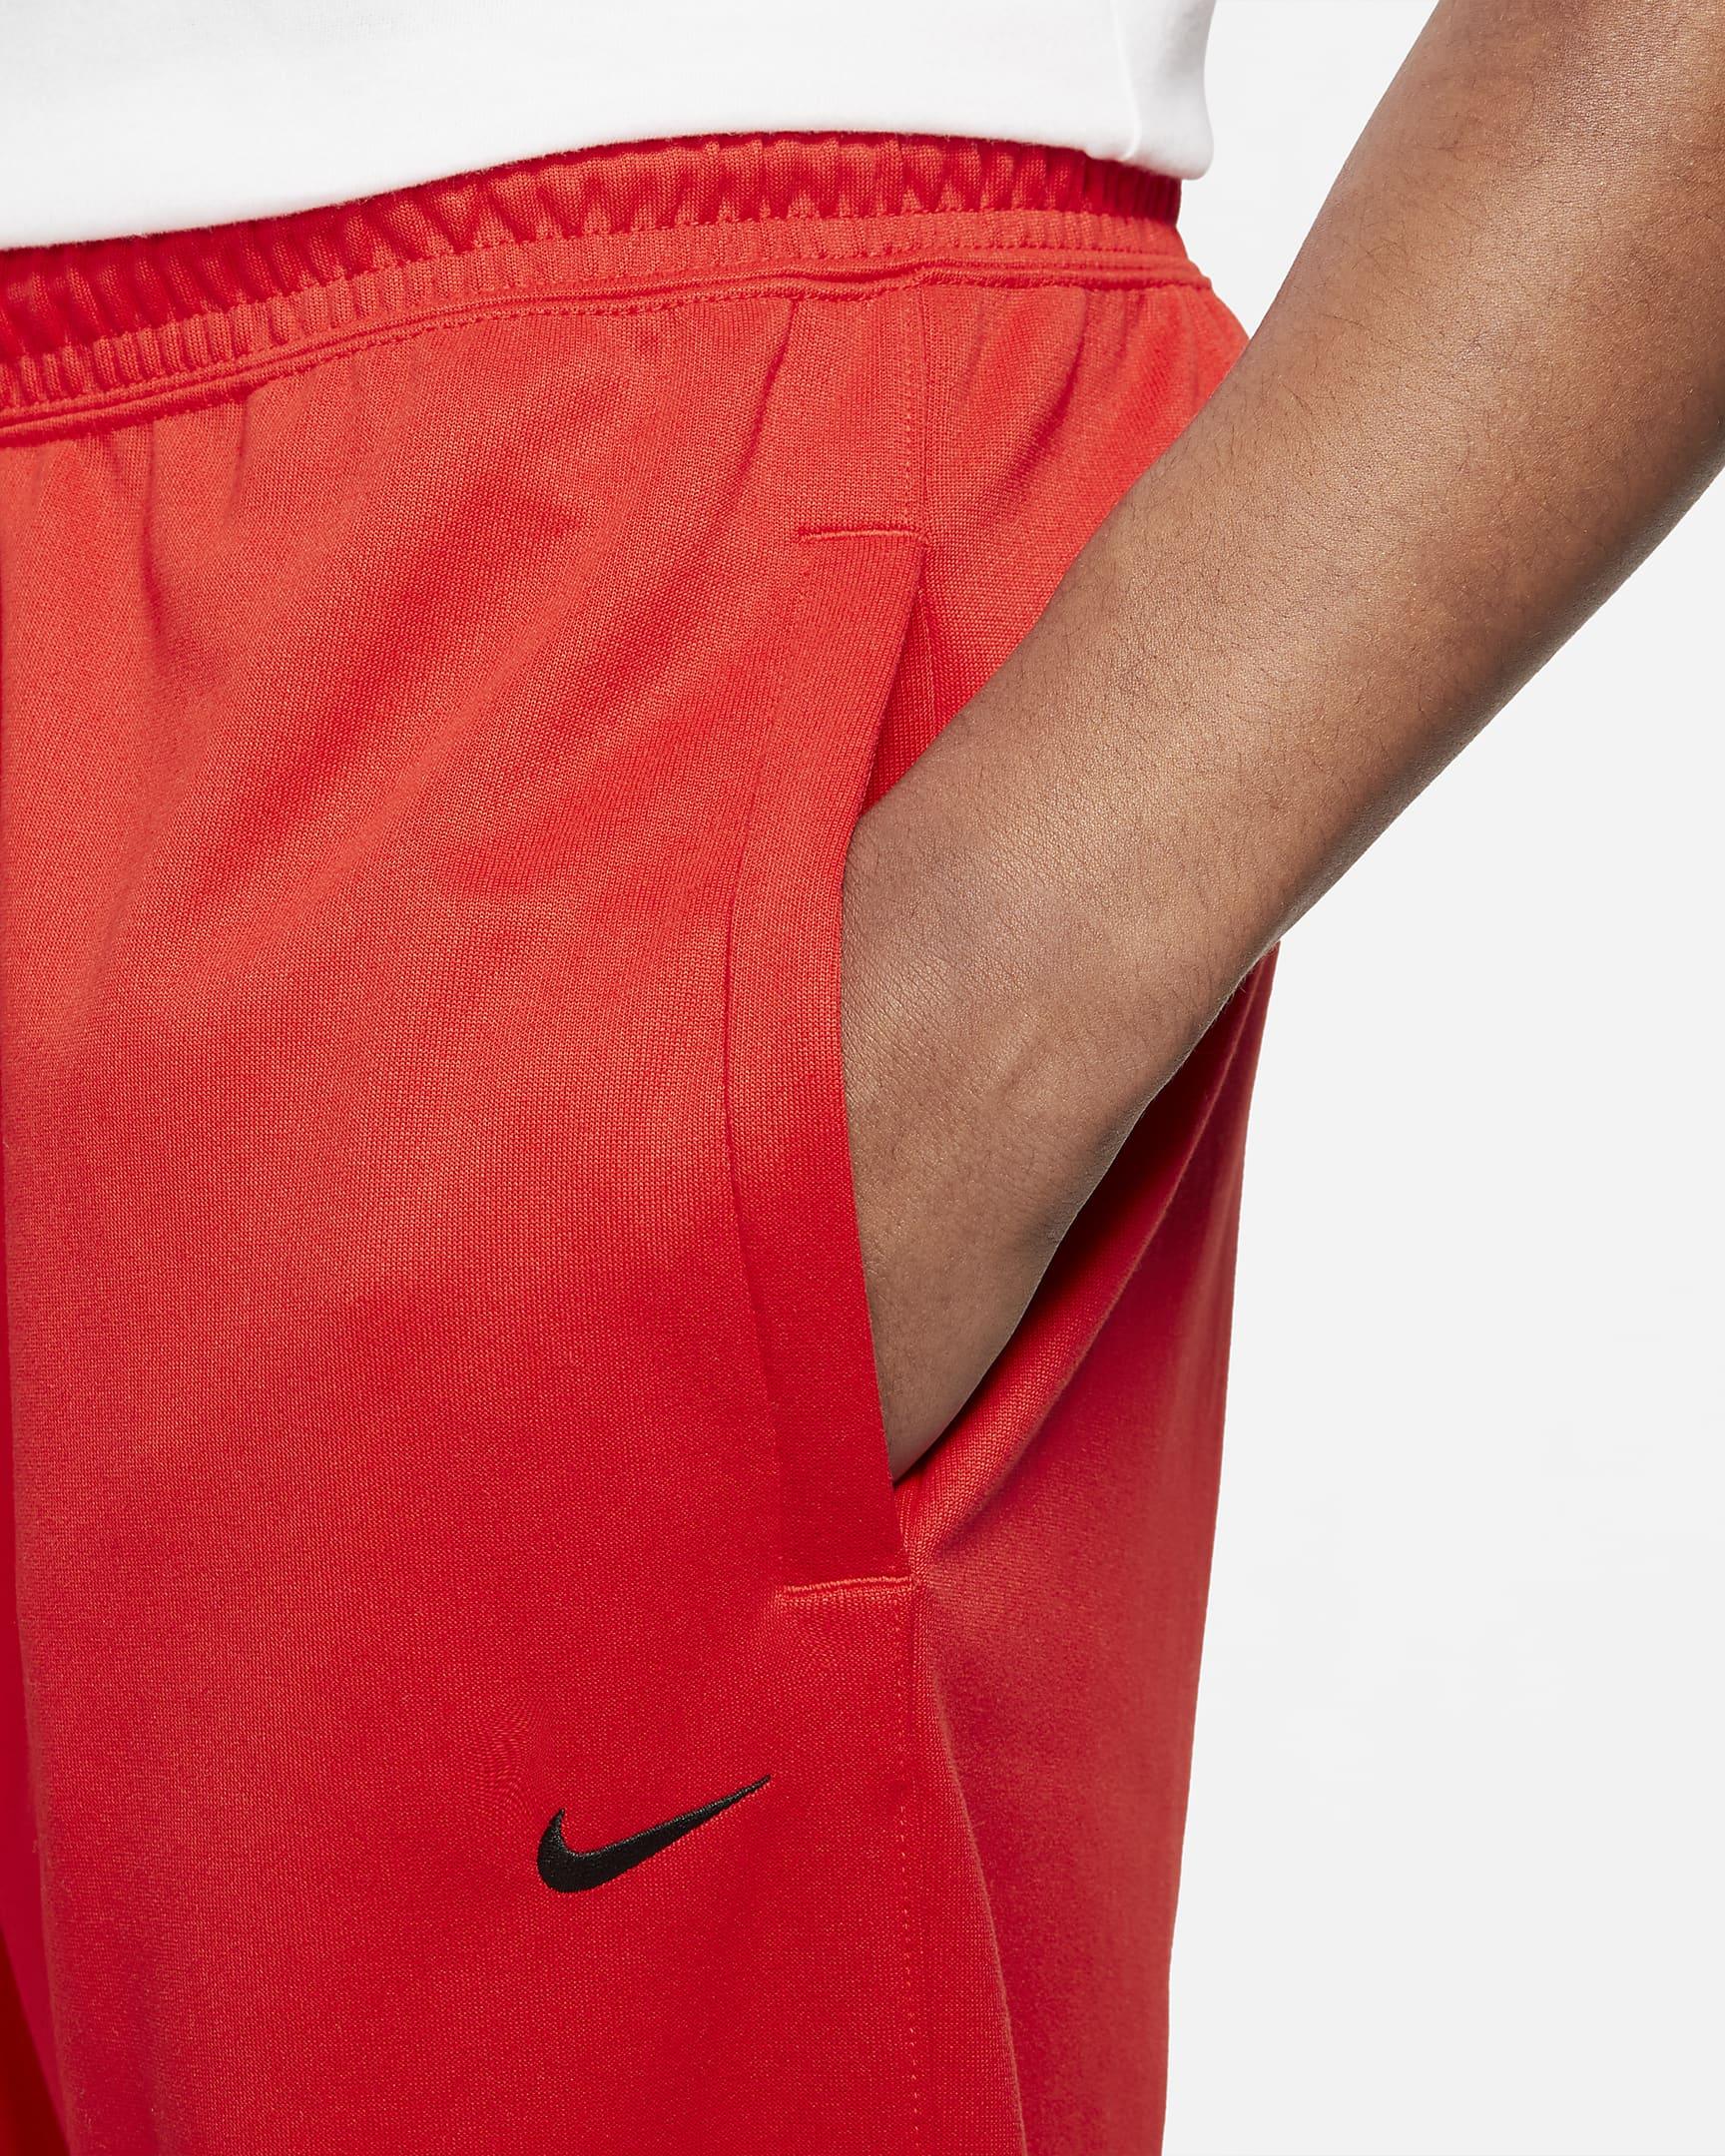 nike-spotlight-mens-basketball-pants-94tvQf-2.png